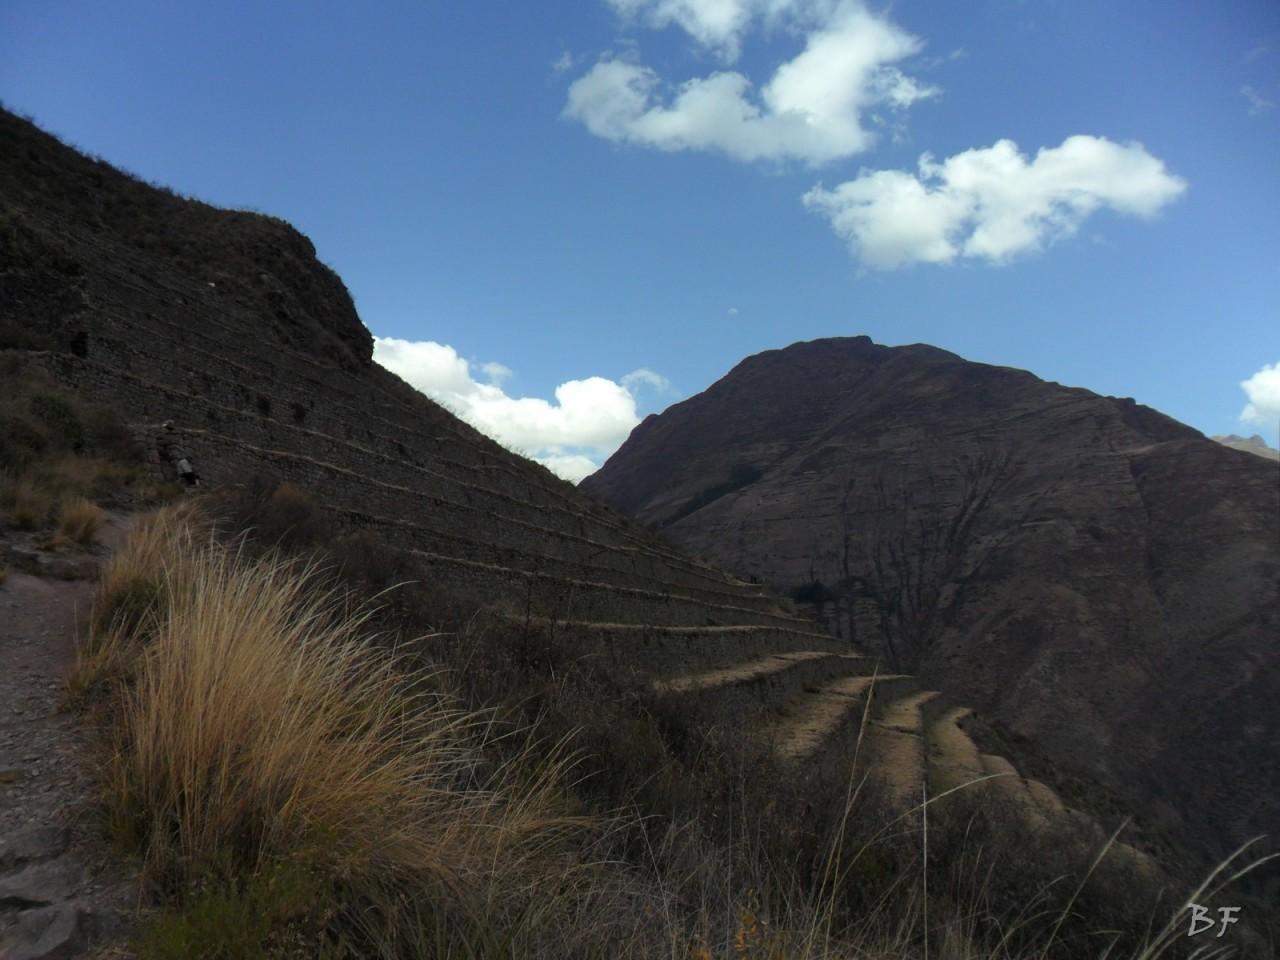 Mura-Poligonali-Megaliti-Altari-Rupestri-Pisac-Cusco-Perù-84